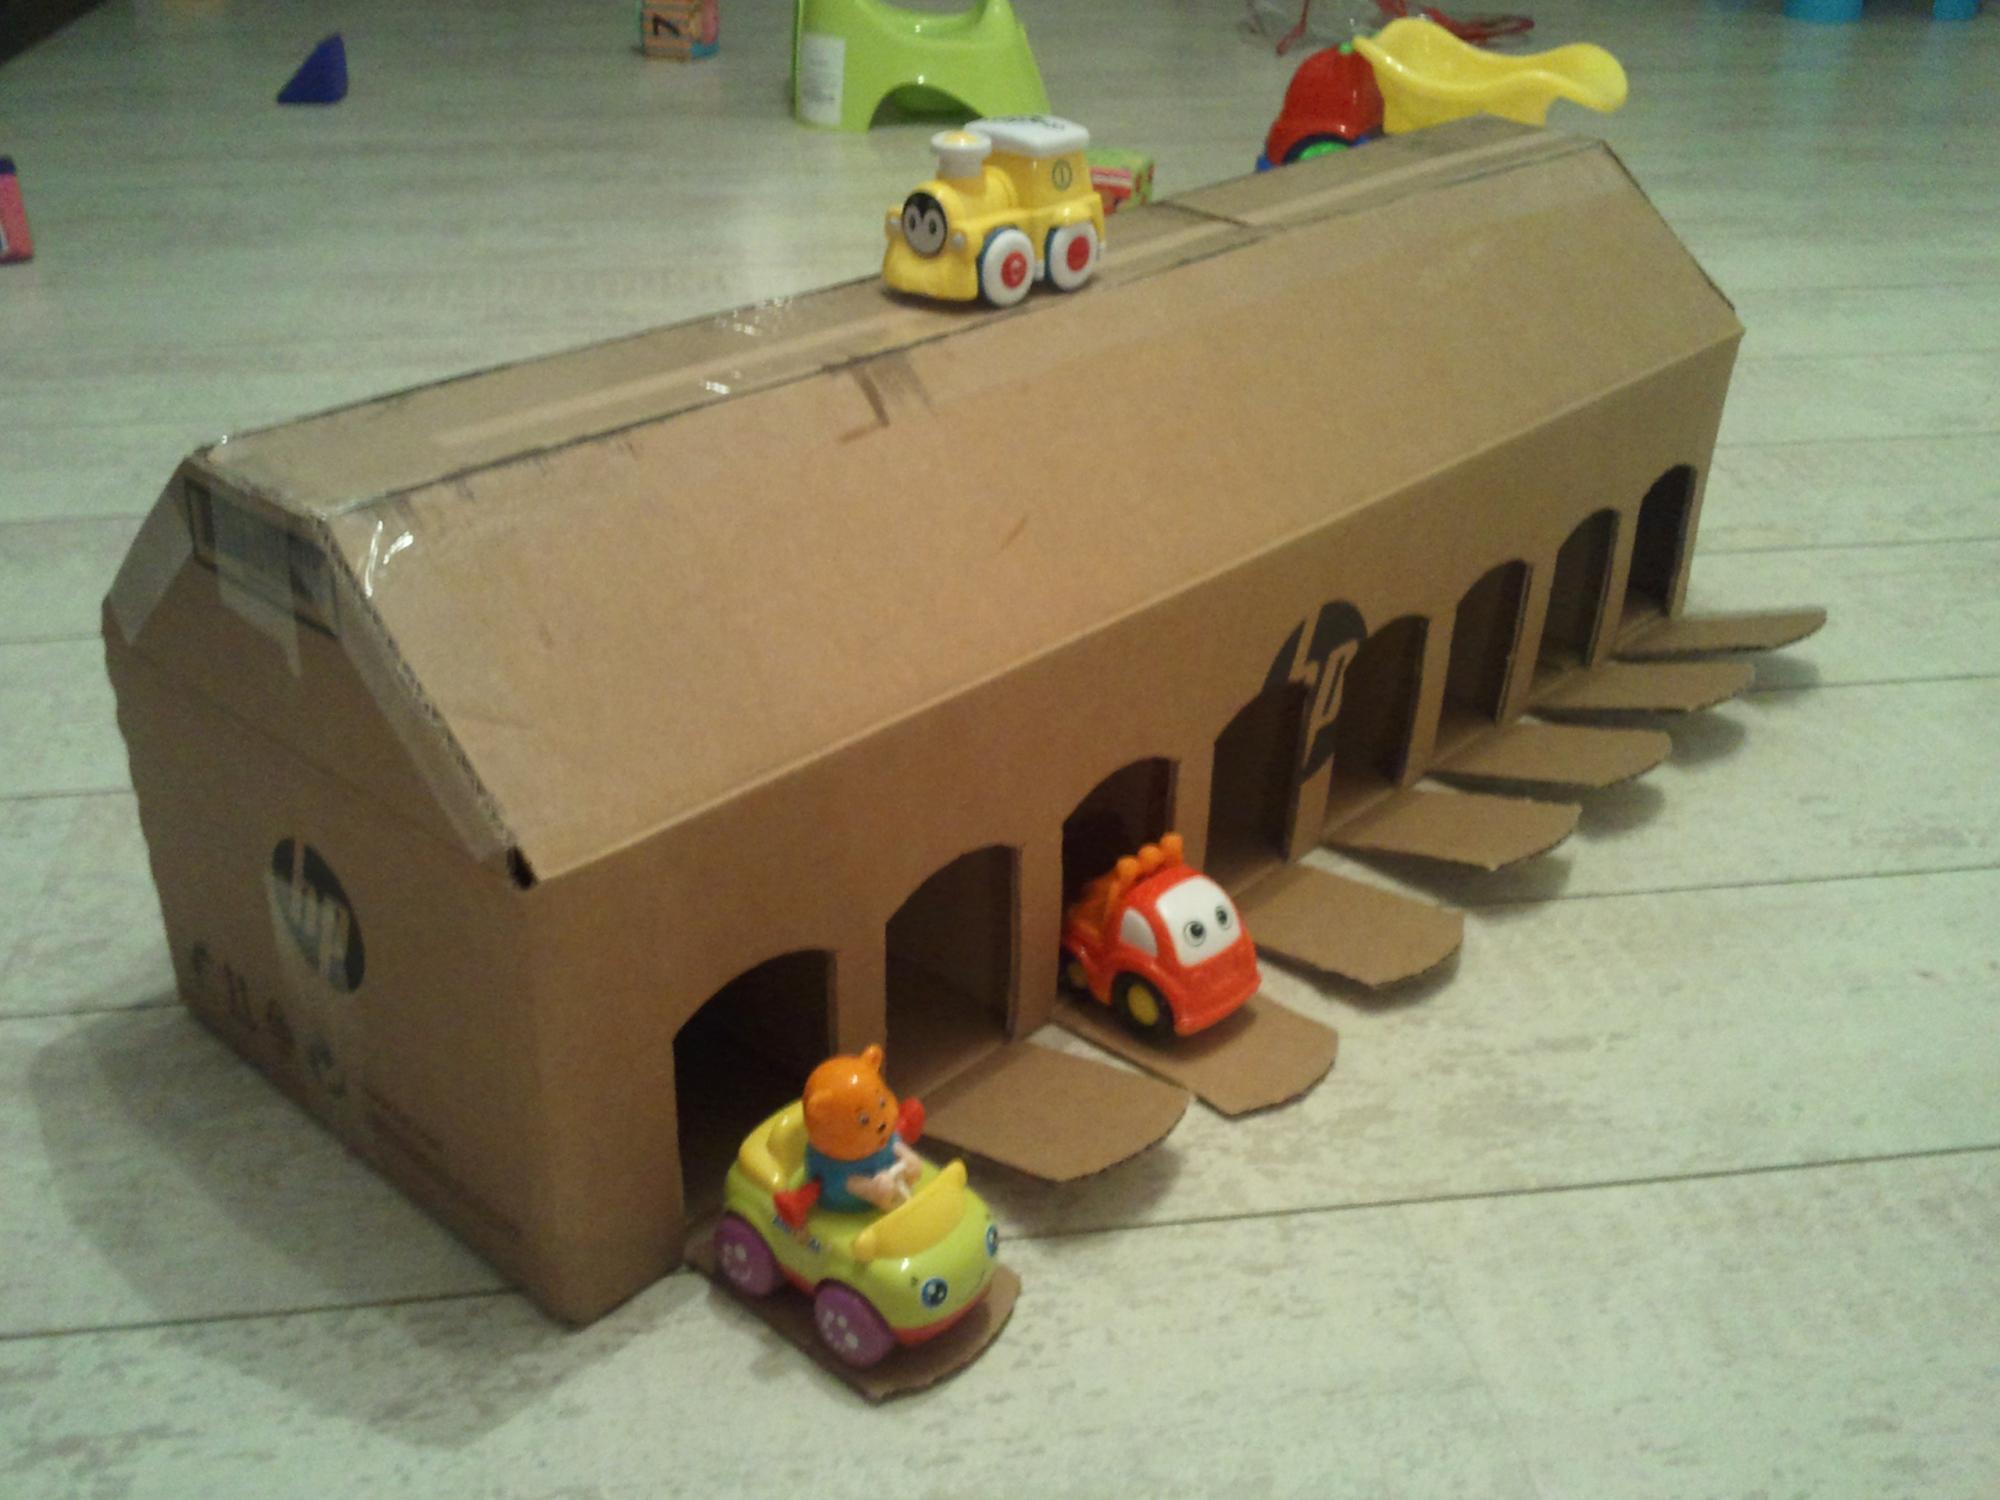 Парковка из коробки для детей своими руками фото 87